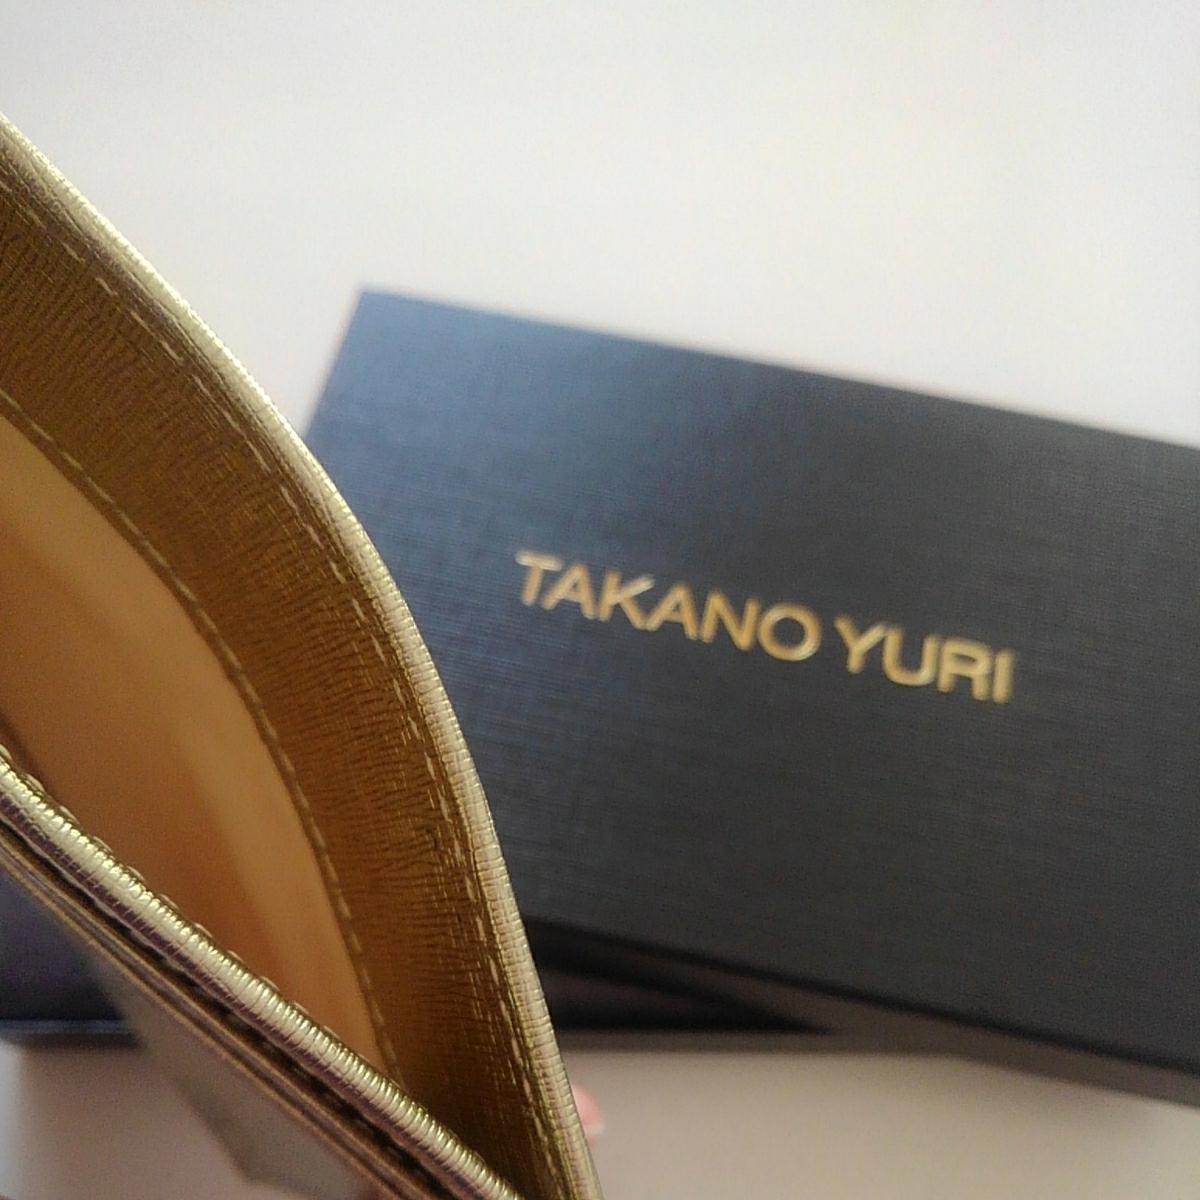 ◇TAKANO YURI 本革オリジナルカードケース ゴールド 箱入 新品◇_画像5